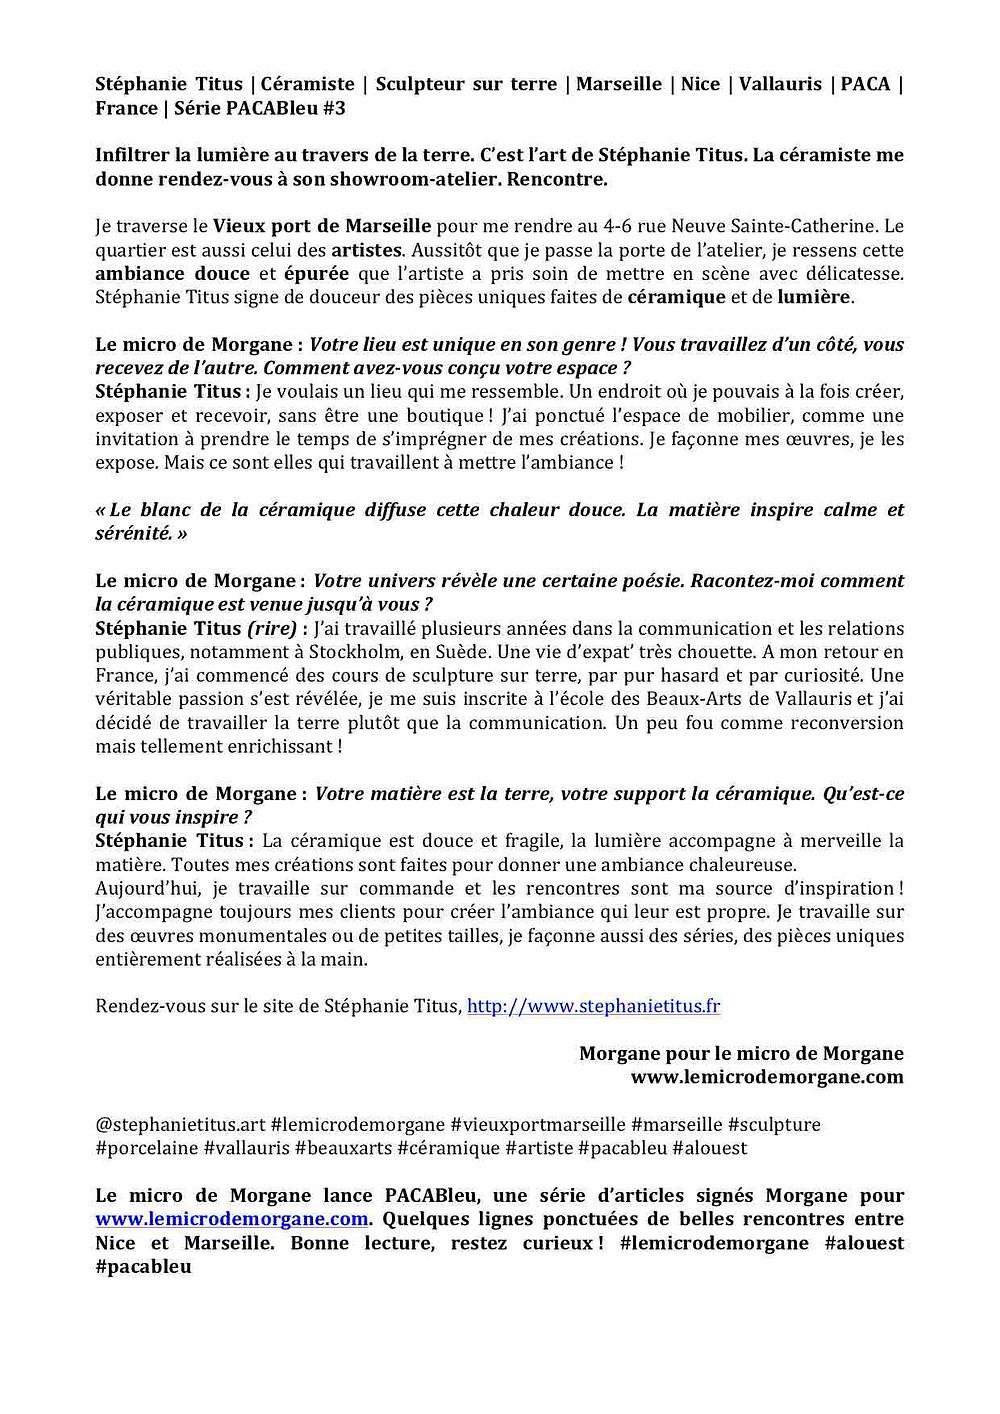 Stéphanie Titus |le micro de Morgane |Céramique |design |Marseille |Nice |France